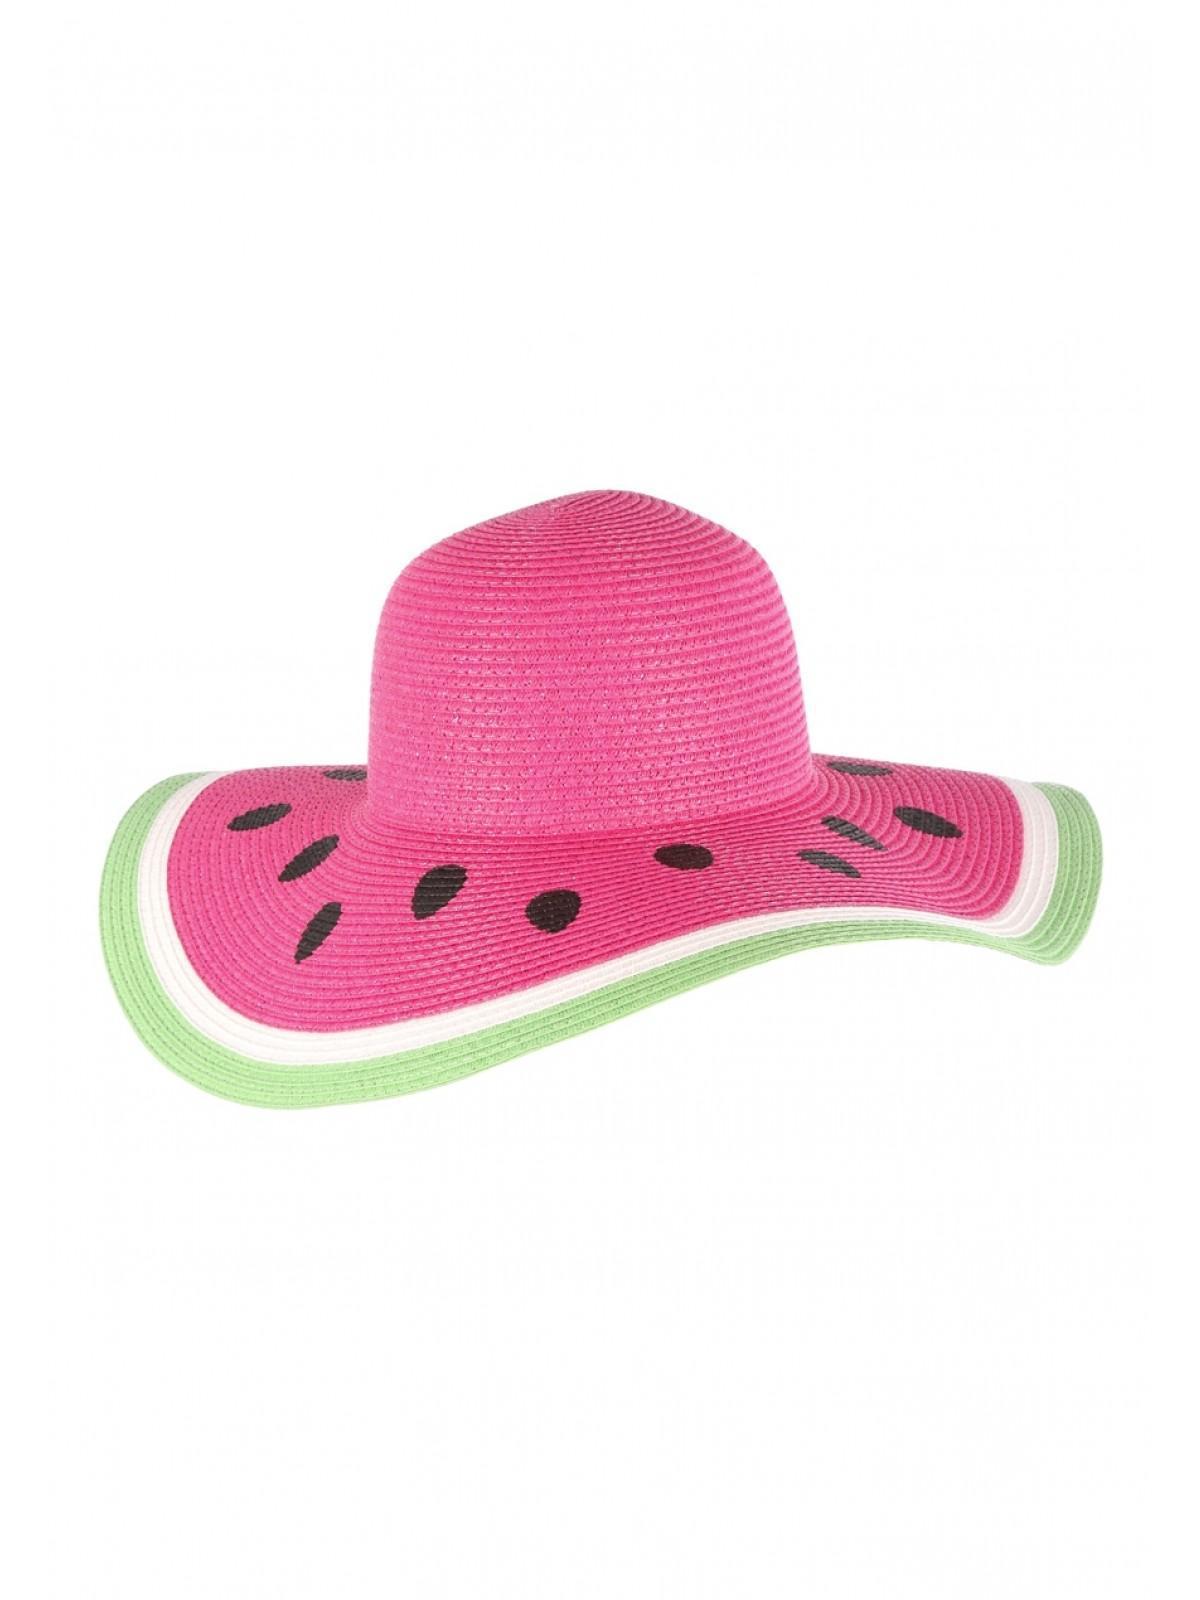 88c3762b Womens Pink Melon Straw Hat | Peacocks